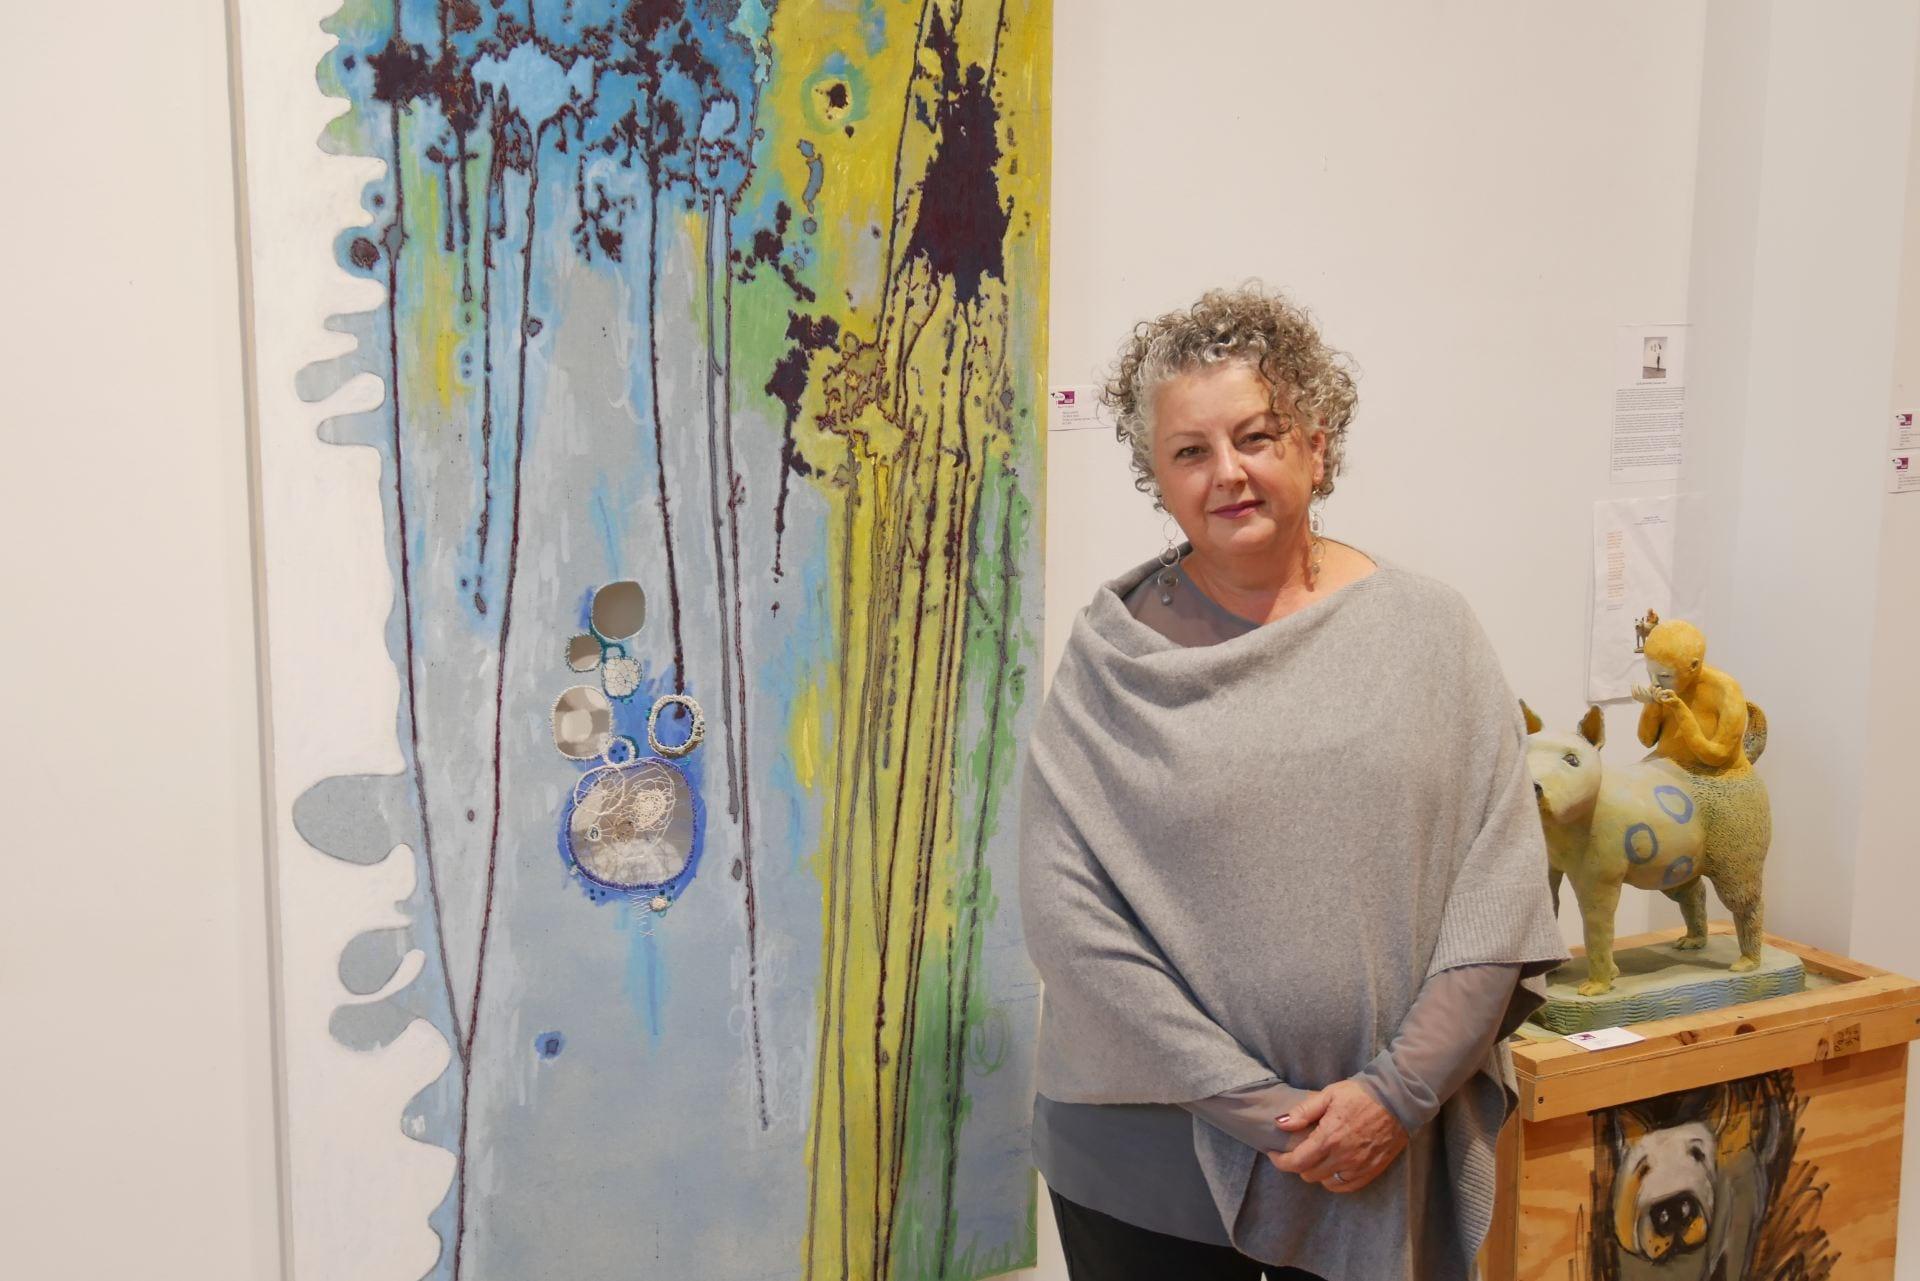 Art Gallery Denounces Trump Administration